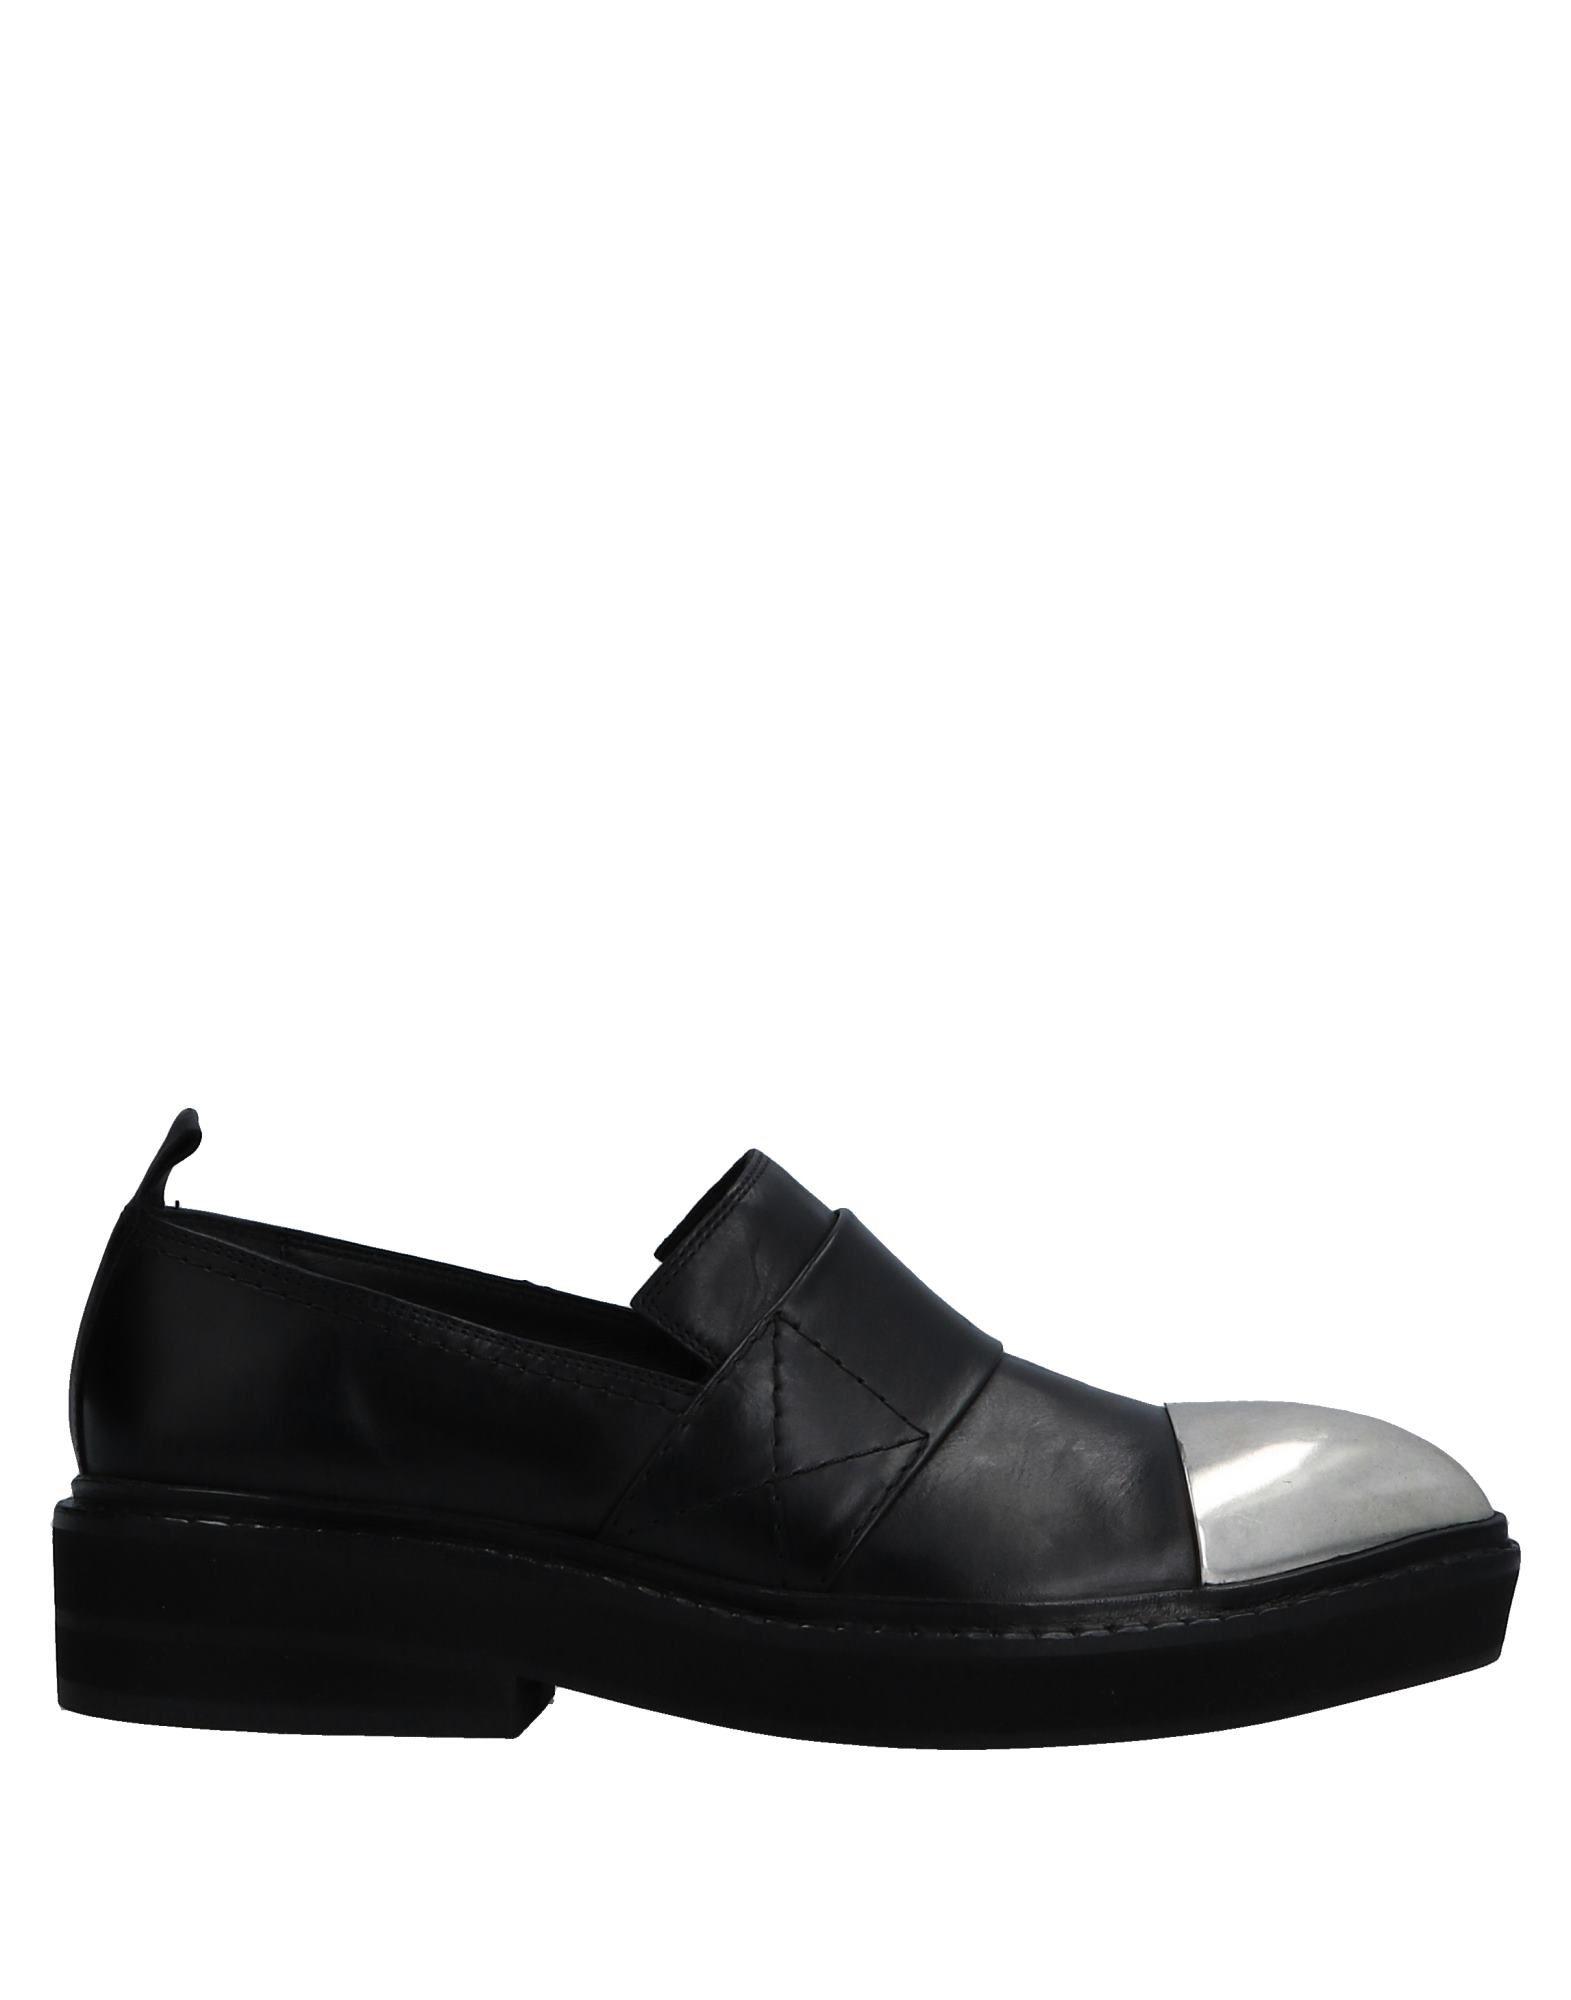 Shy By Arvid Yuki Loafers Arvid - Women Shy By Arvid Loafers Yuki Loafers online on  United Kingdom - 11526934ST 3f866f